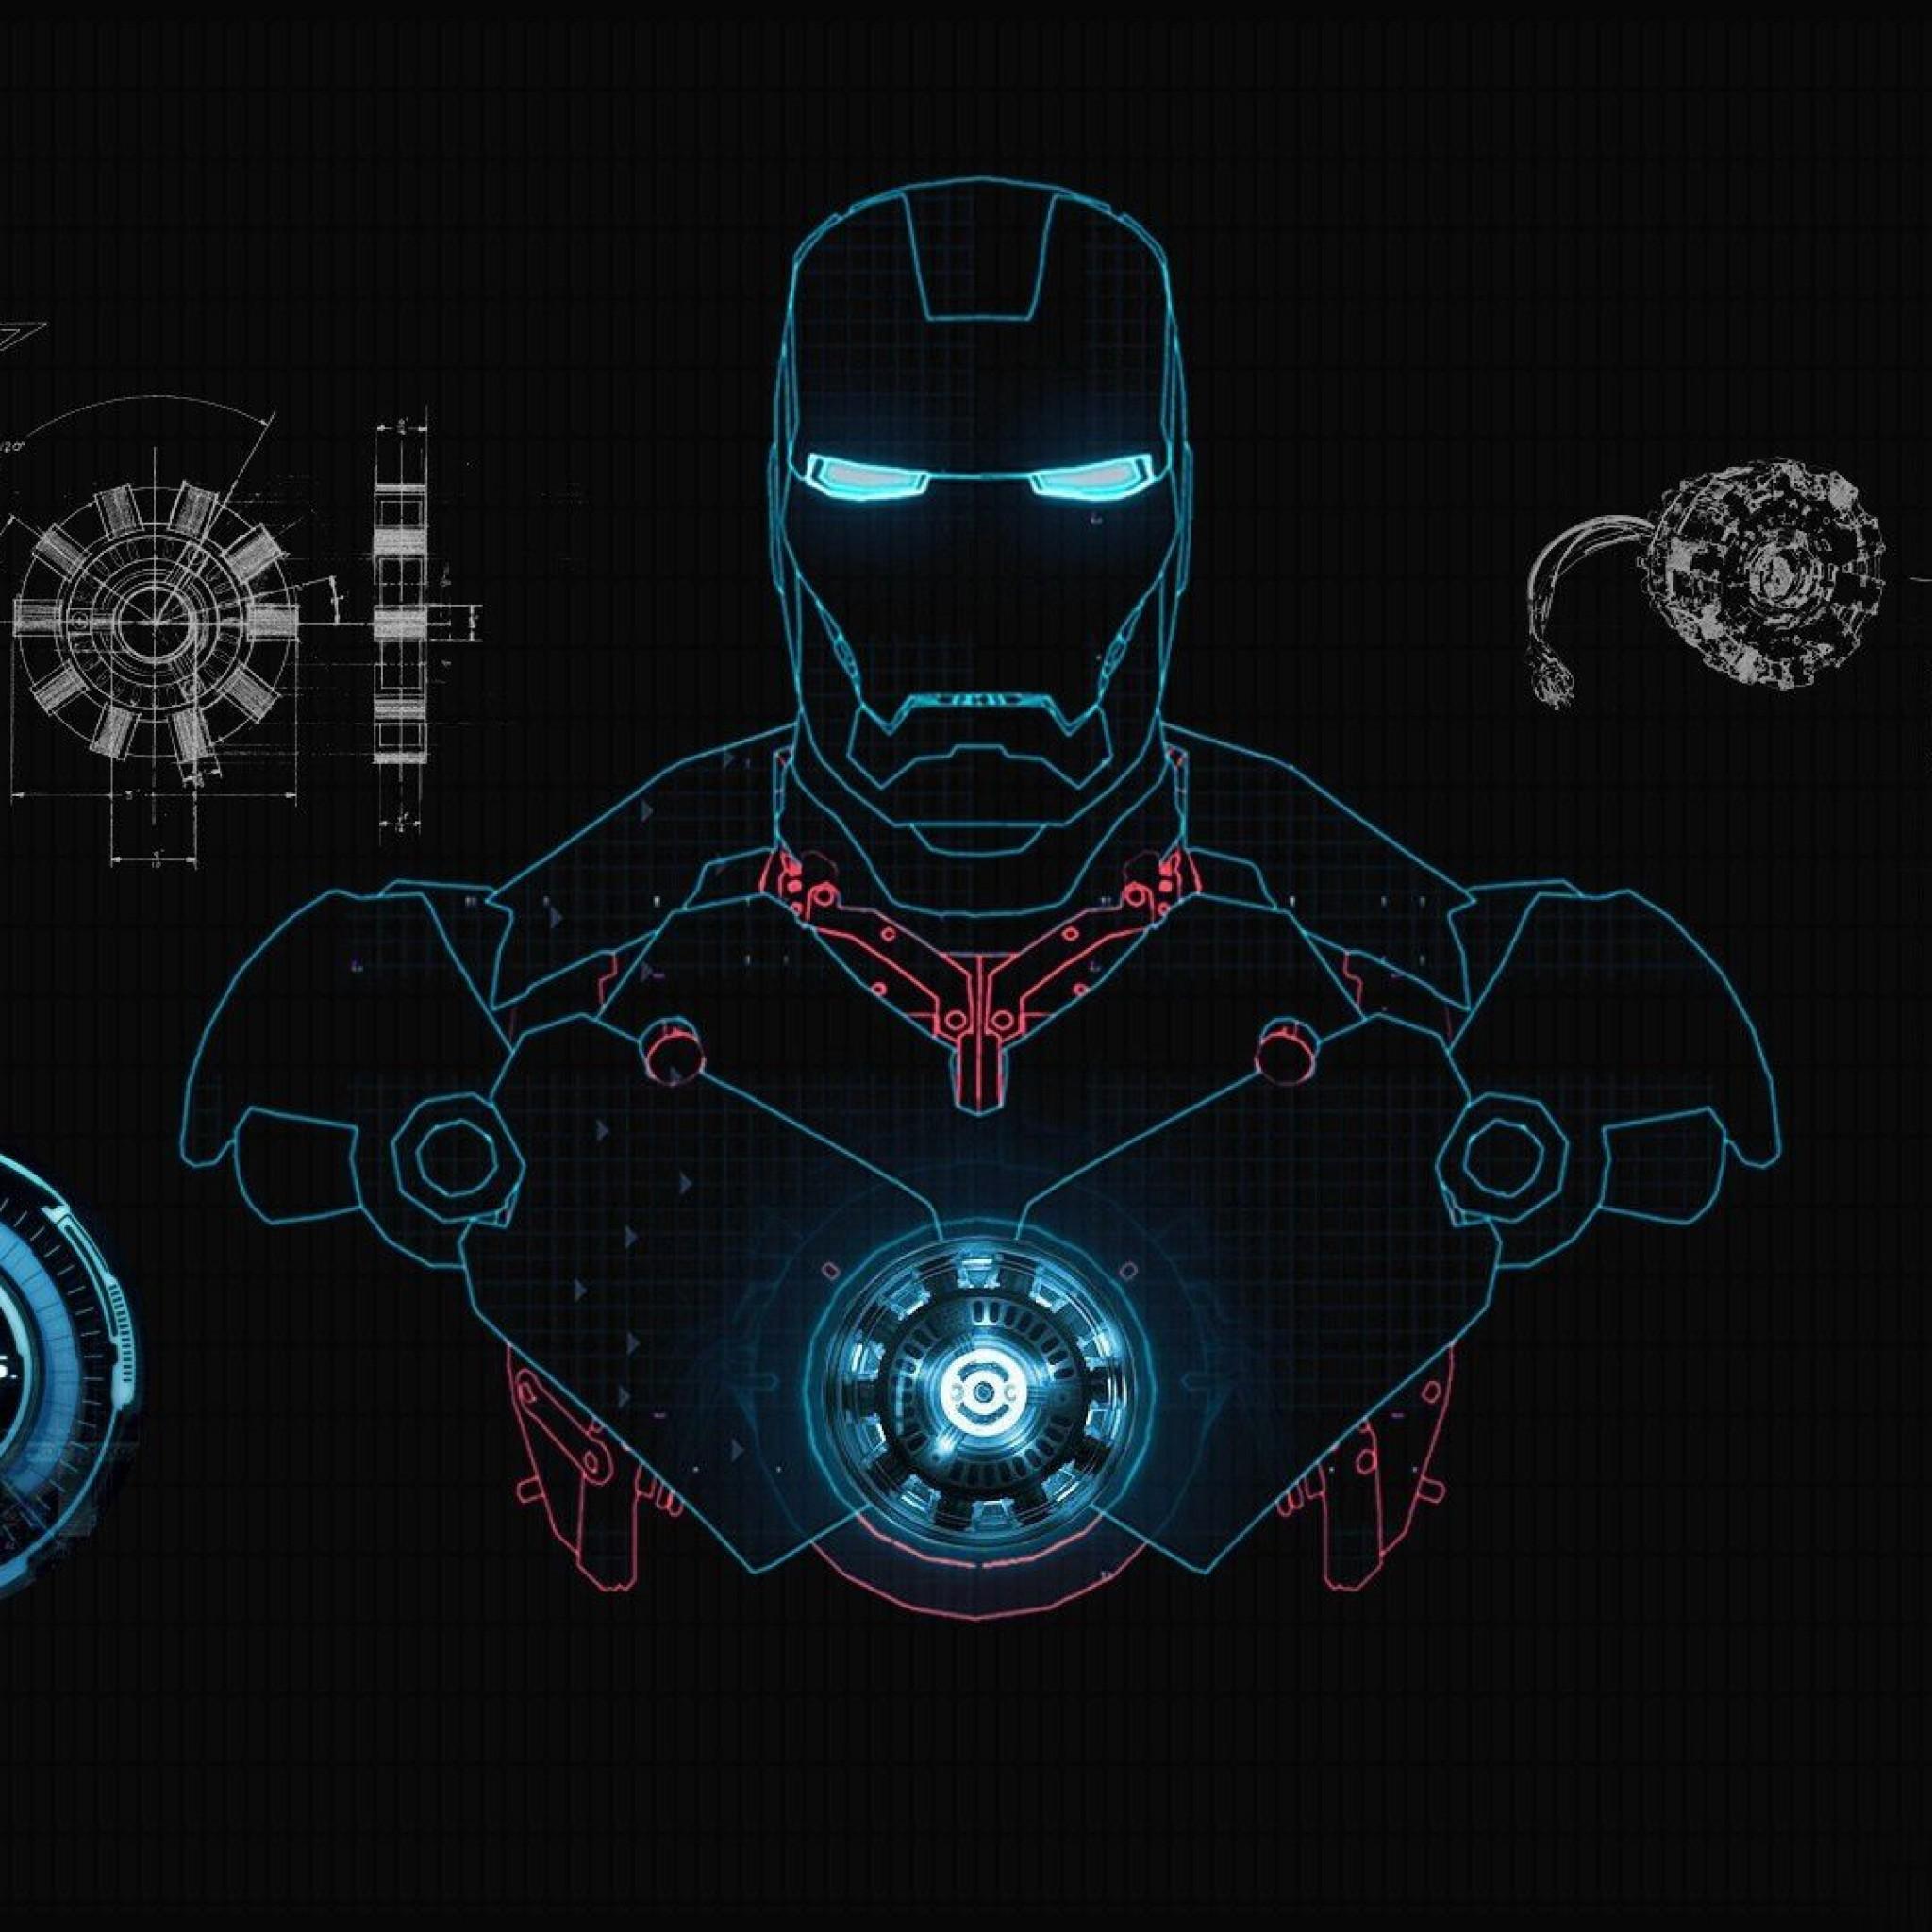 Iron Man Jarvis Wallpaper HD - WallpaperSafari